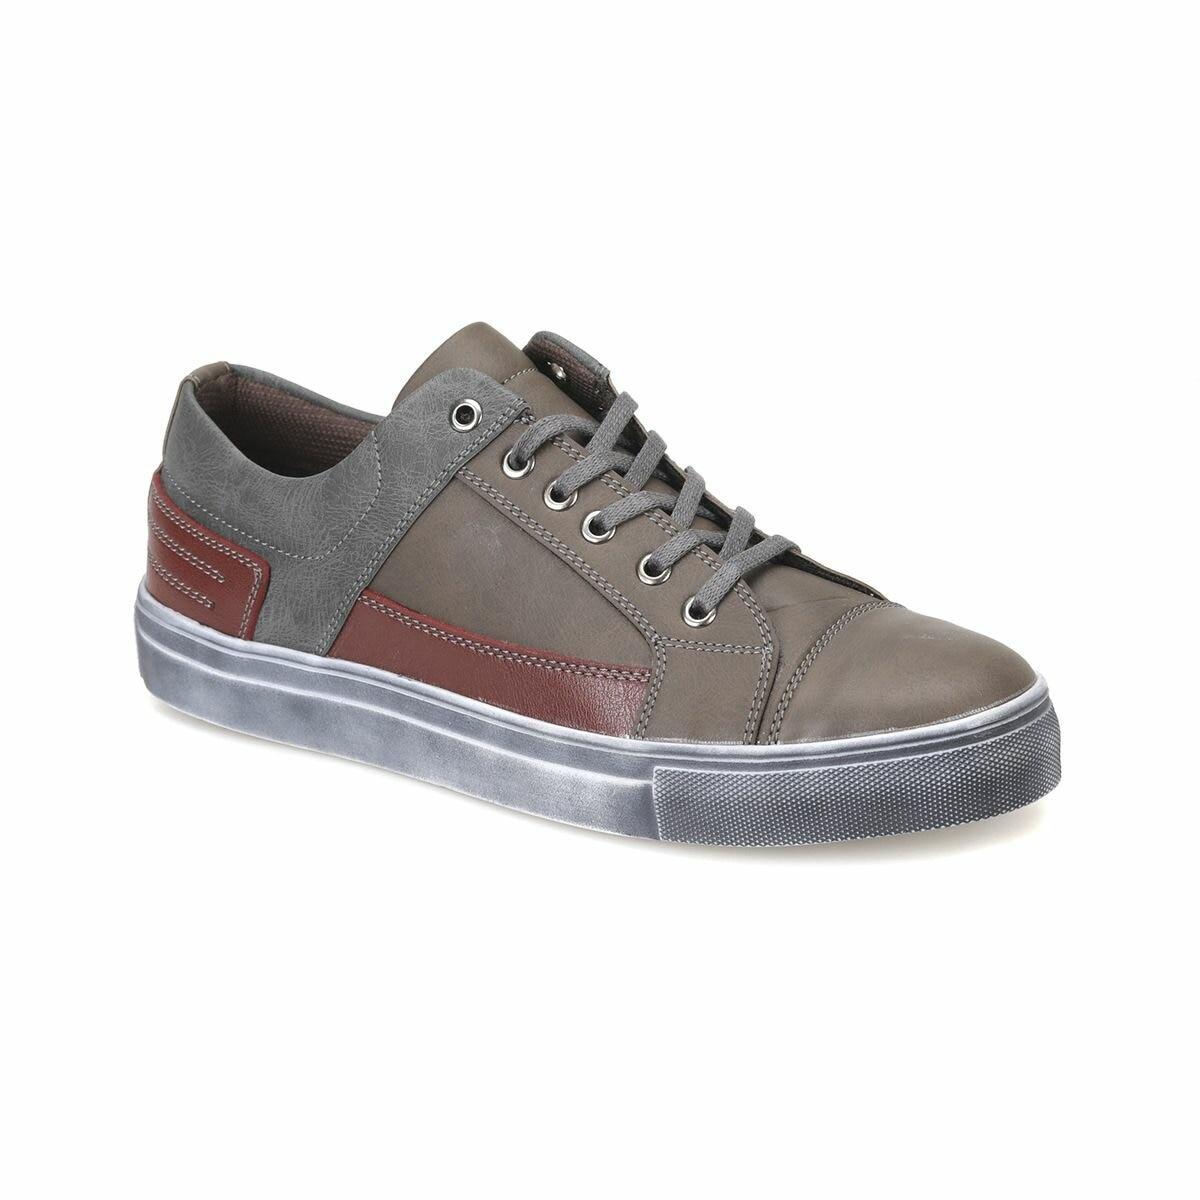 FLO SG-07 Brown Men Shoes Panama Club